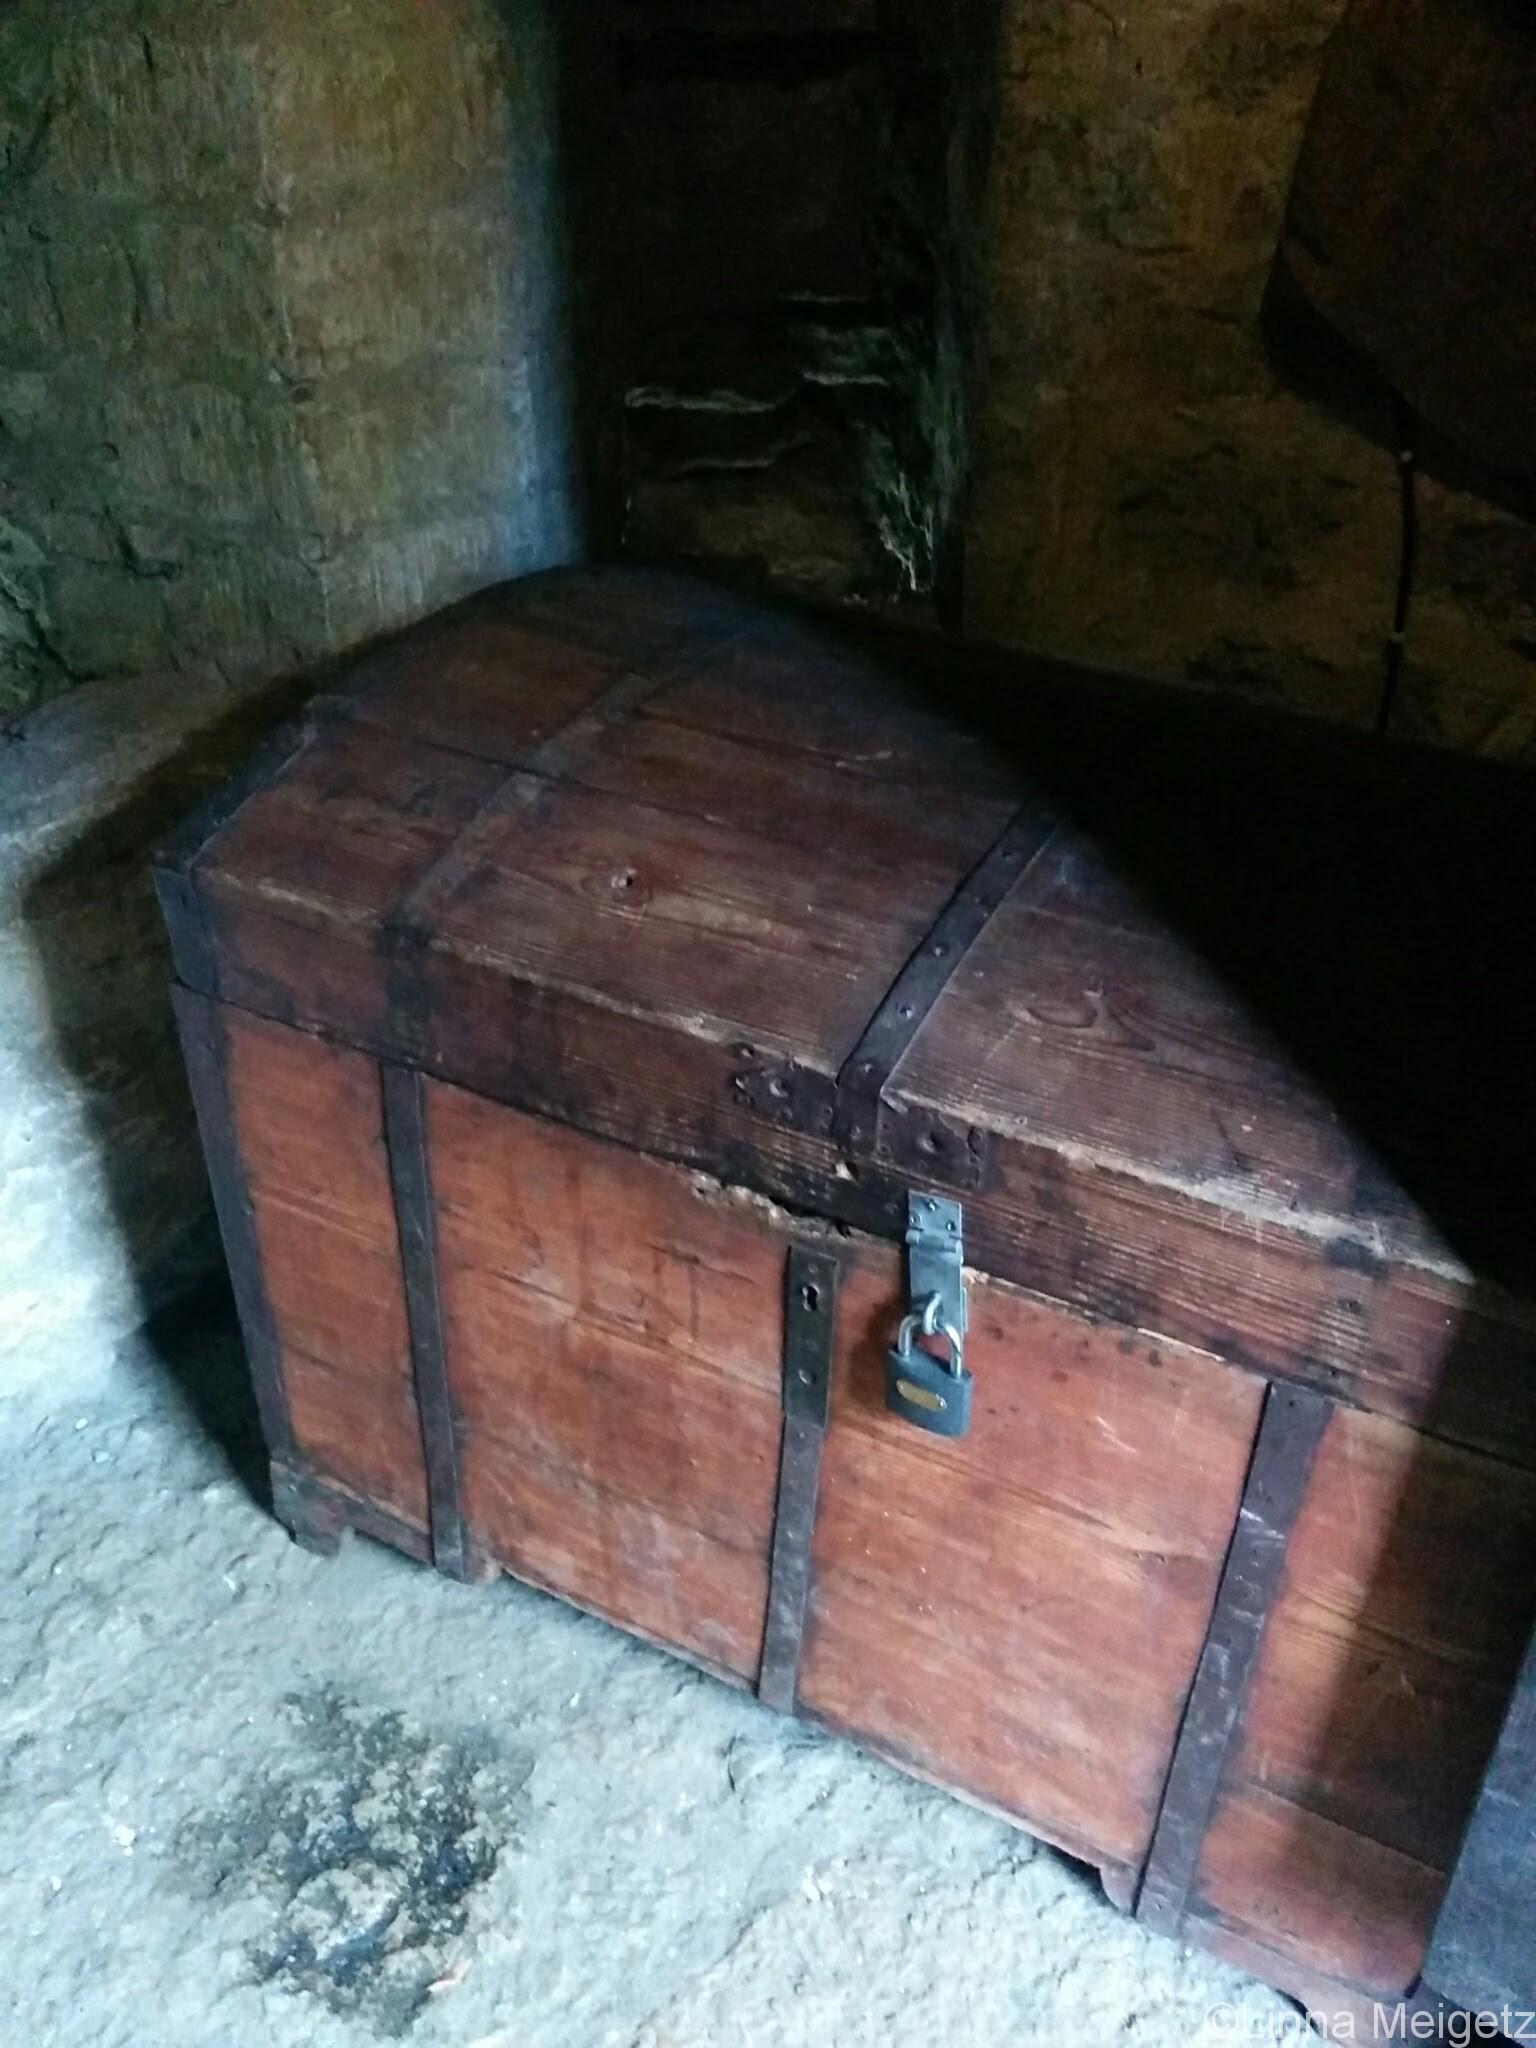 「Danneborg」の階段の踊り場にある宝箱